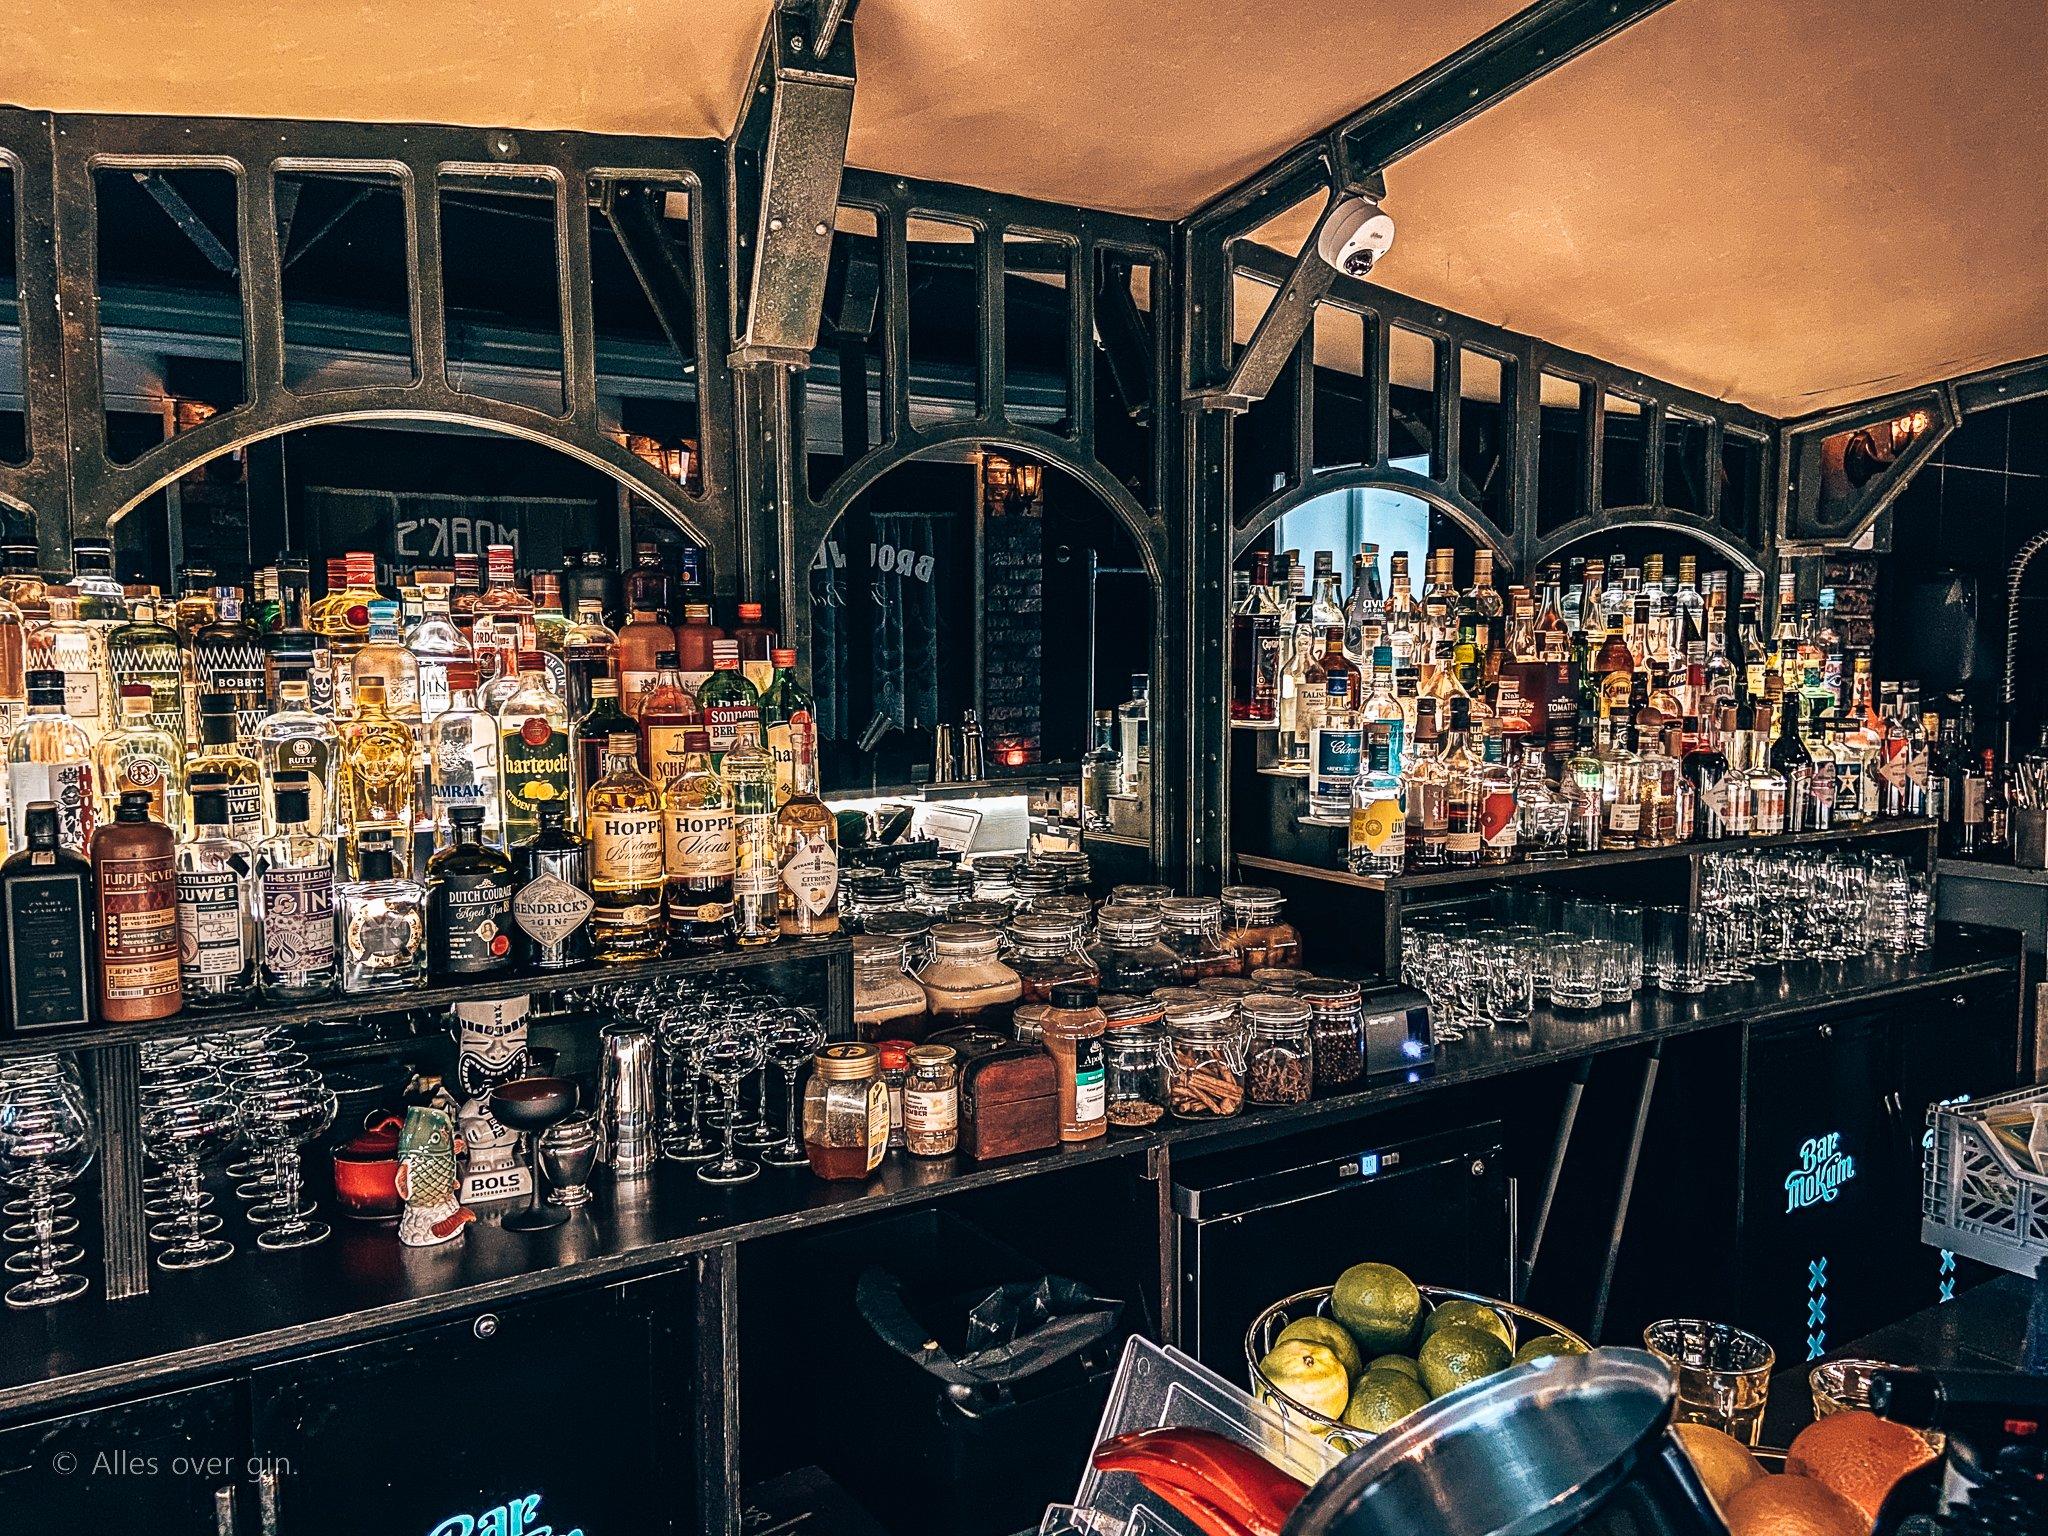 Nederlandse distillaten bij Bar Mokum, Amsterdam, Alles over gin.